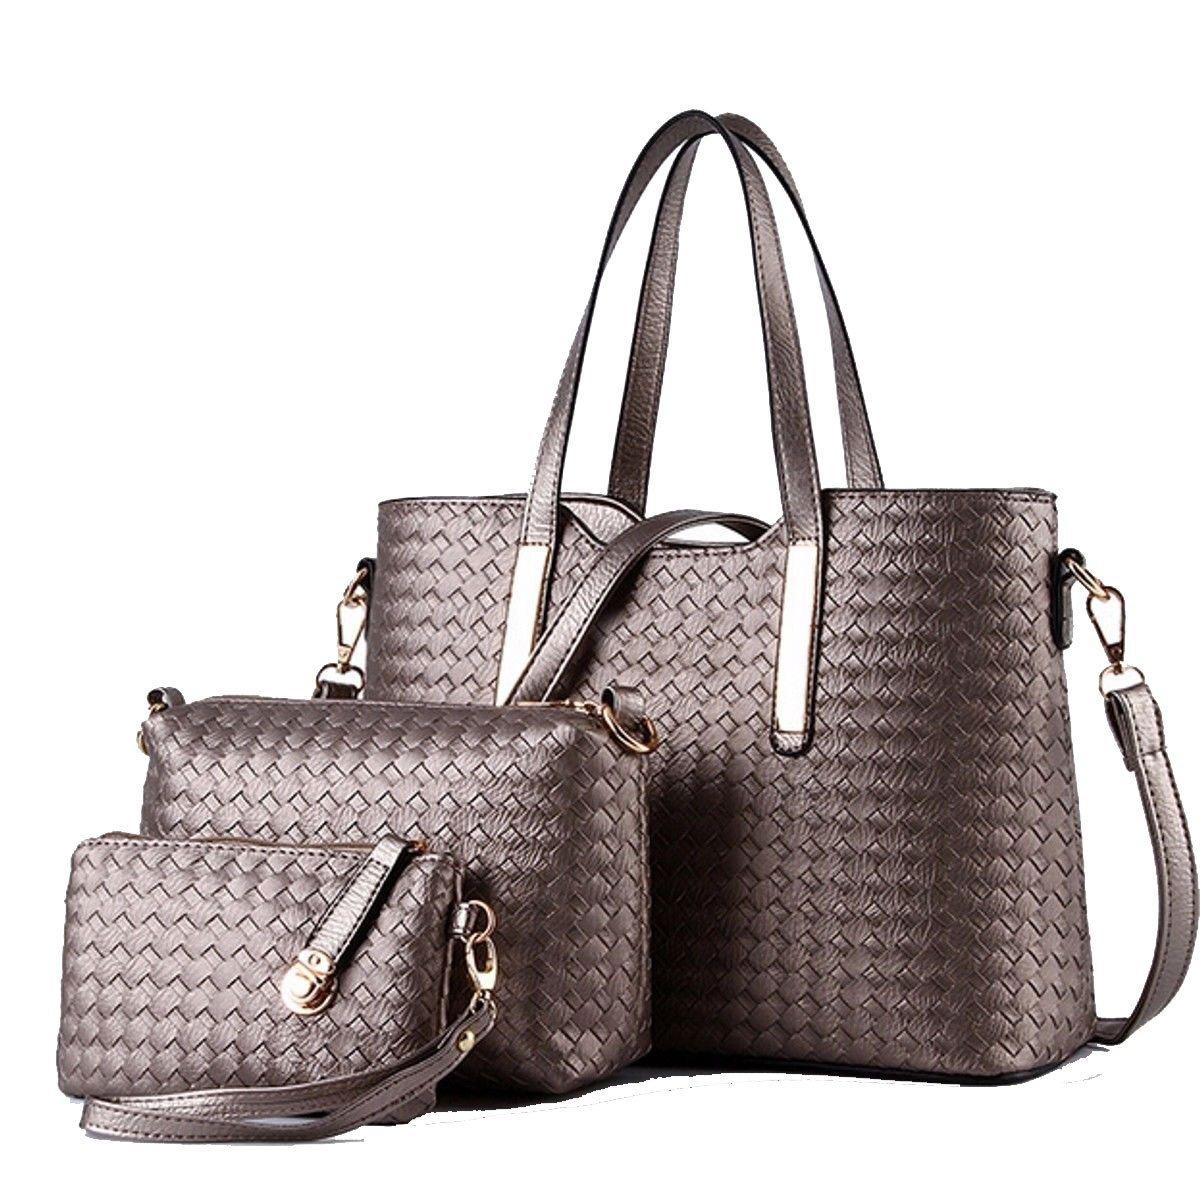 3PCS/SET Women PU Leather Satchel Handbag Shoulder Messenger Crossbody Bag Wallet (Black): Handbags: Amazon.com